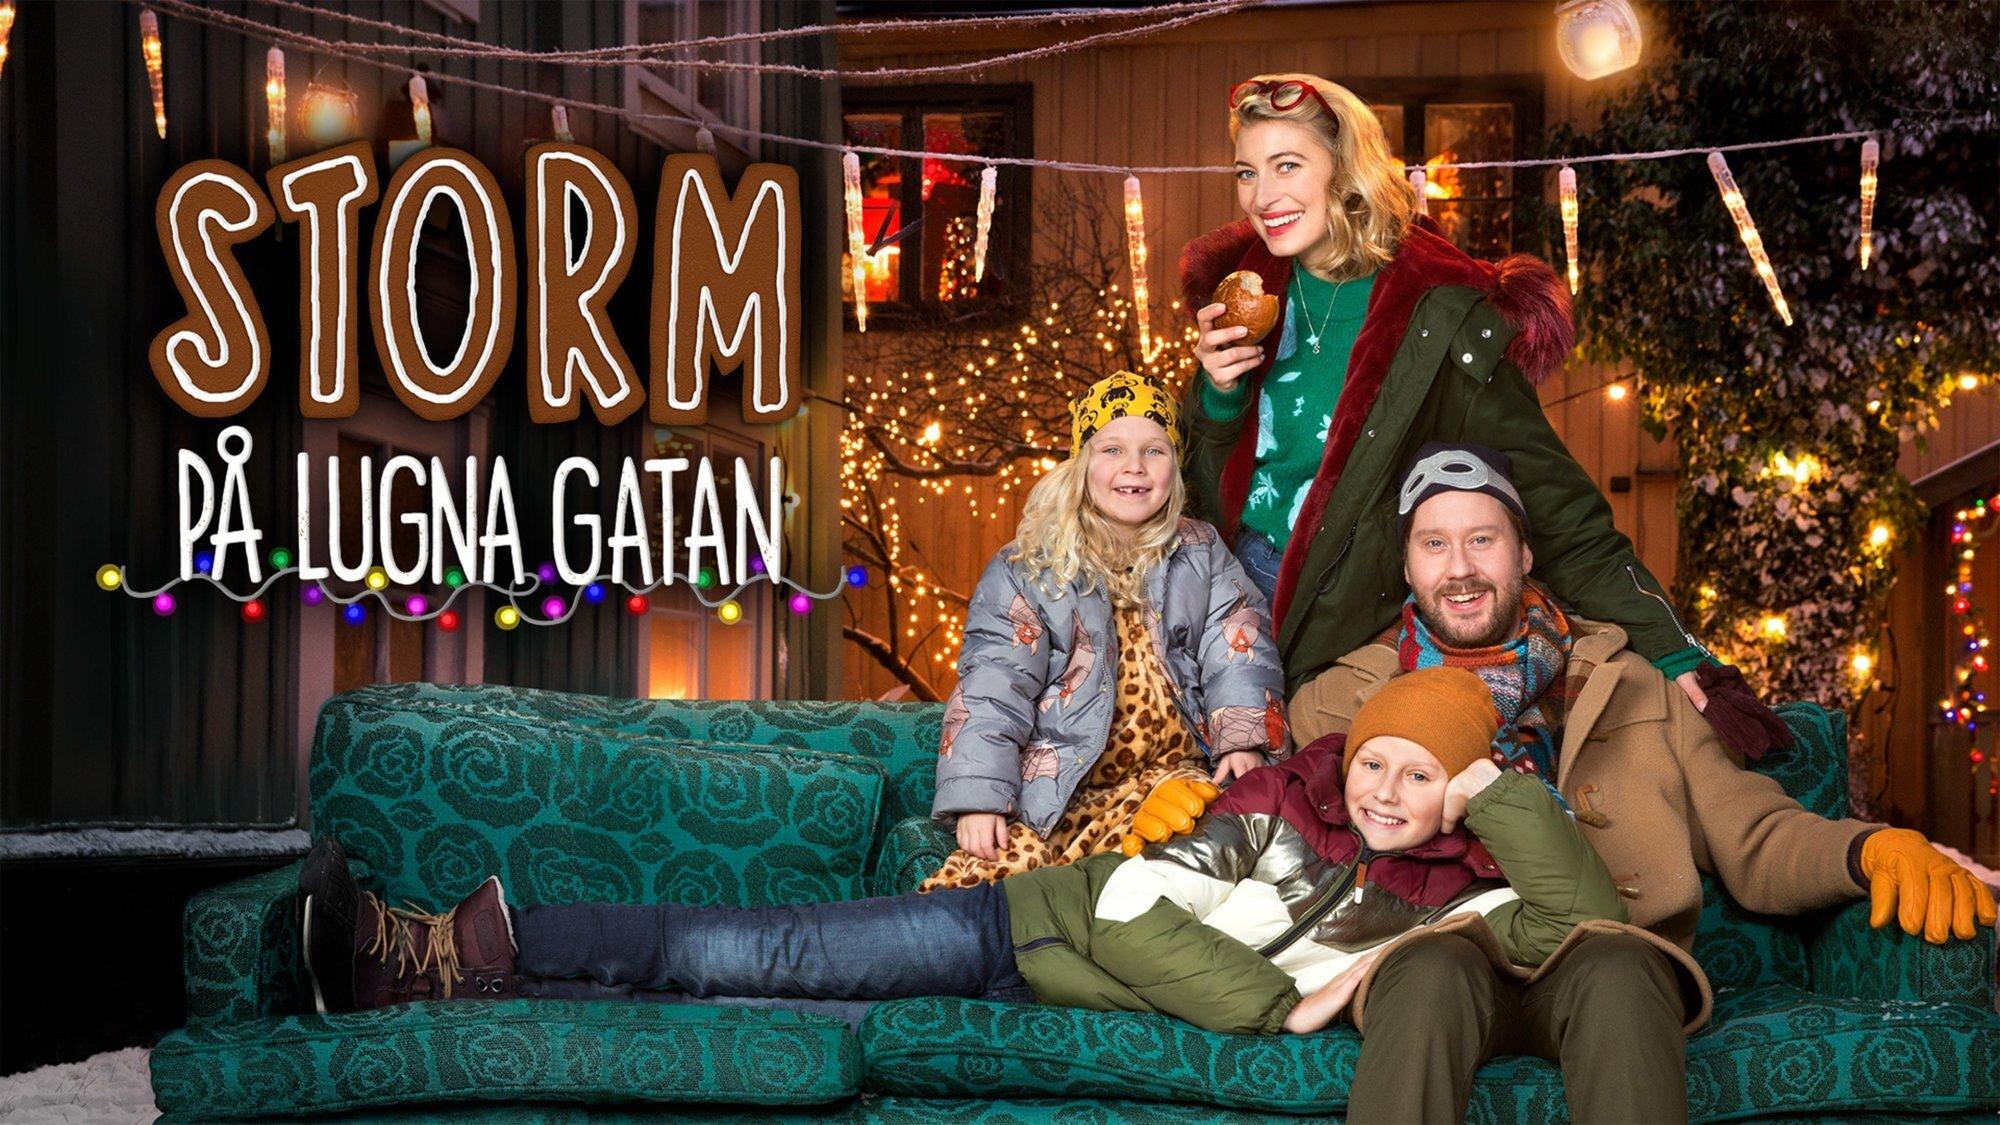 Julkalendern: Storm på Lugna gatan